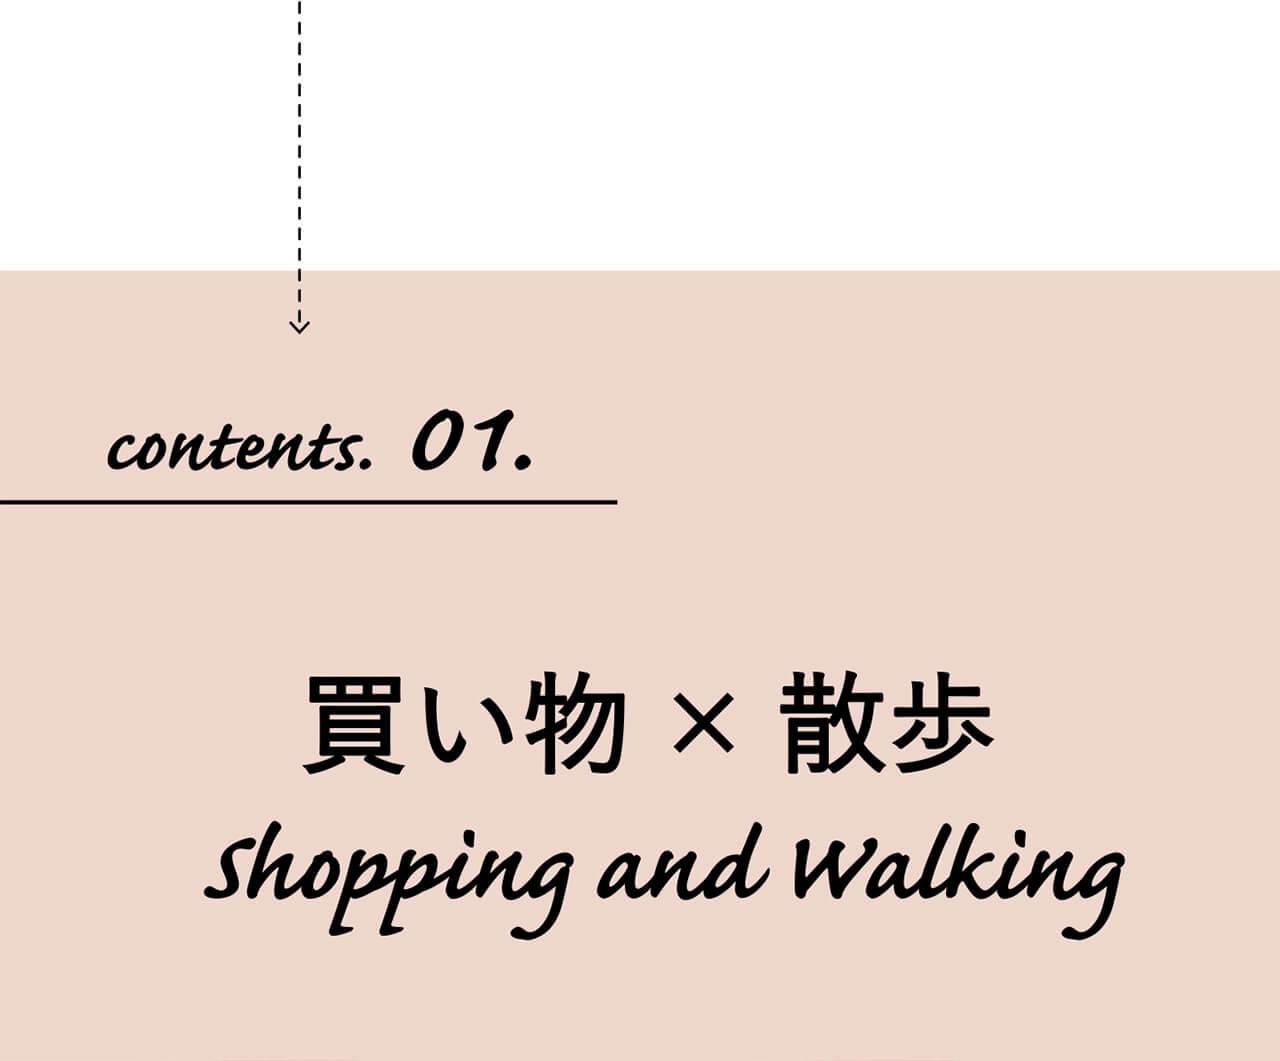 contents. 01.買い物×散歩shopping & walking